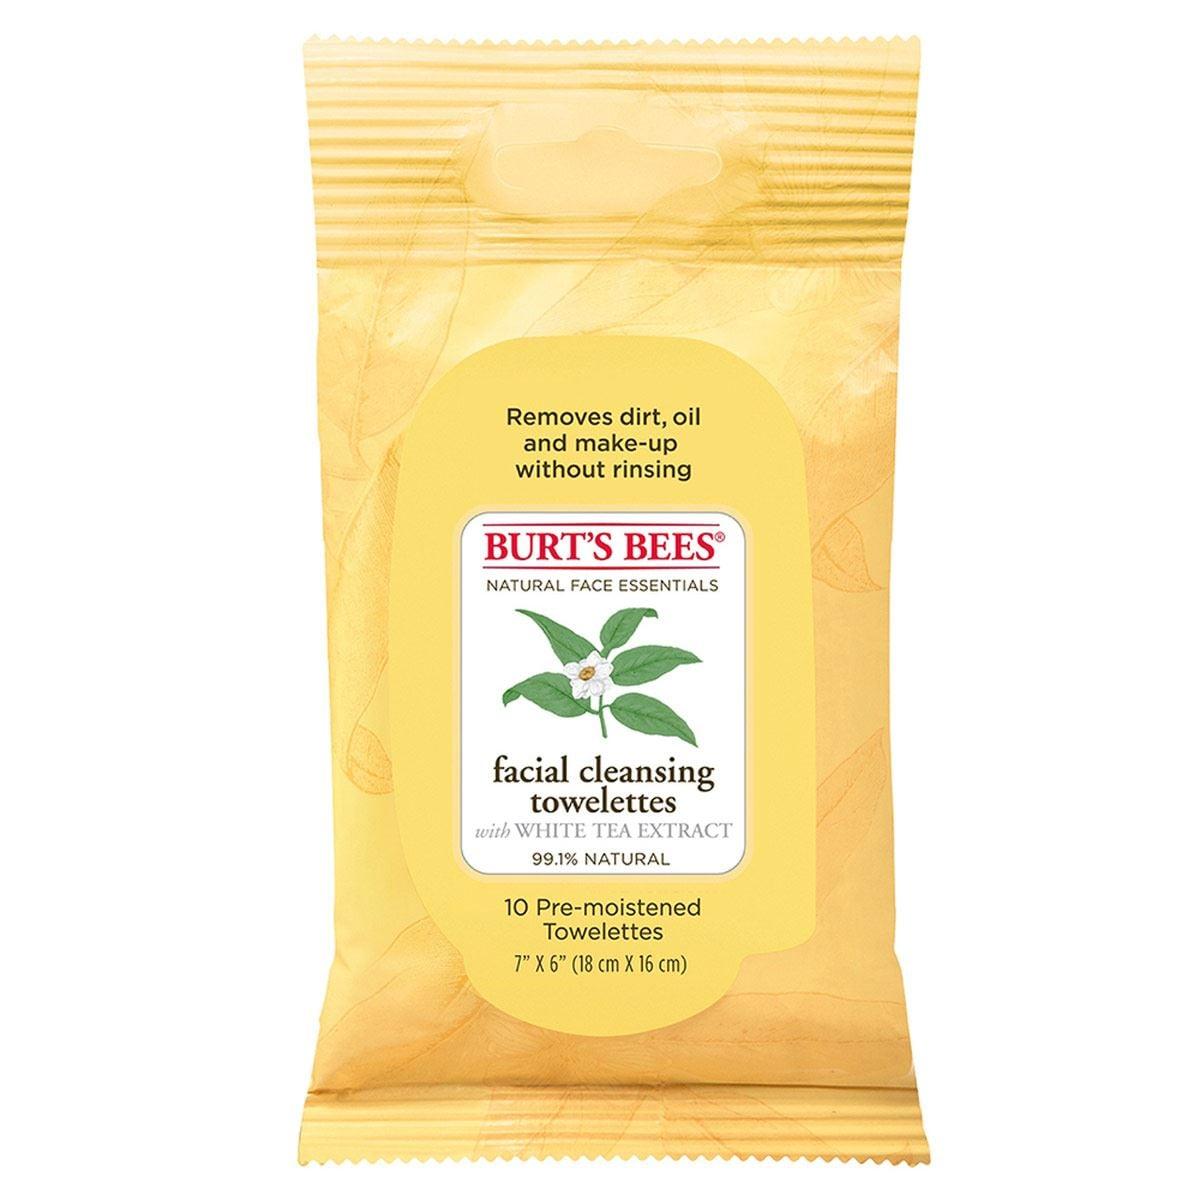 Toallitas de Té Blanco 10 pz Burt's Bees